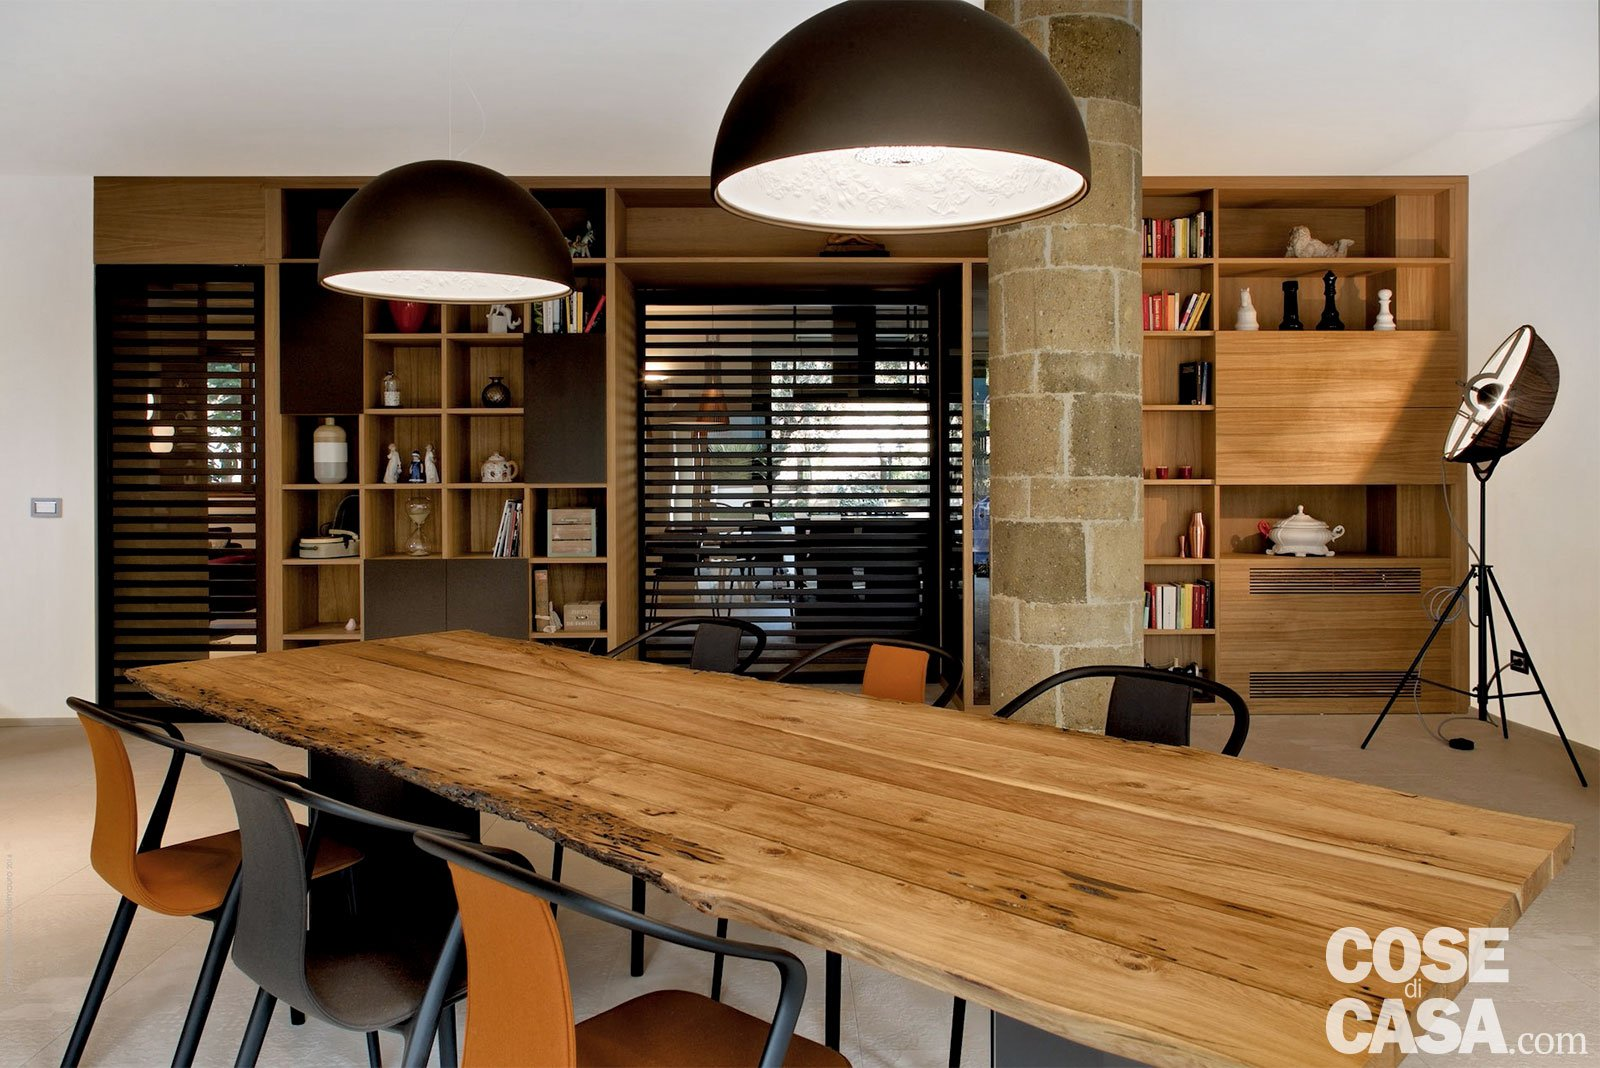 Cucina Soggiorno Open Space Rustico. Top Un Camino Che Rende La ...